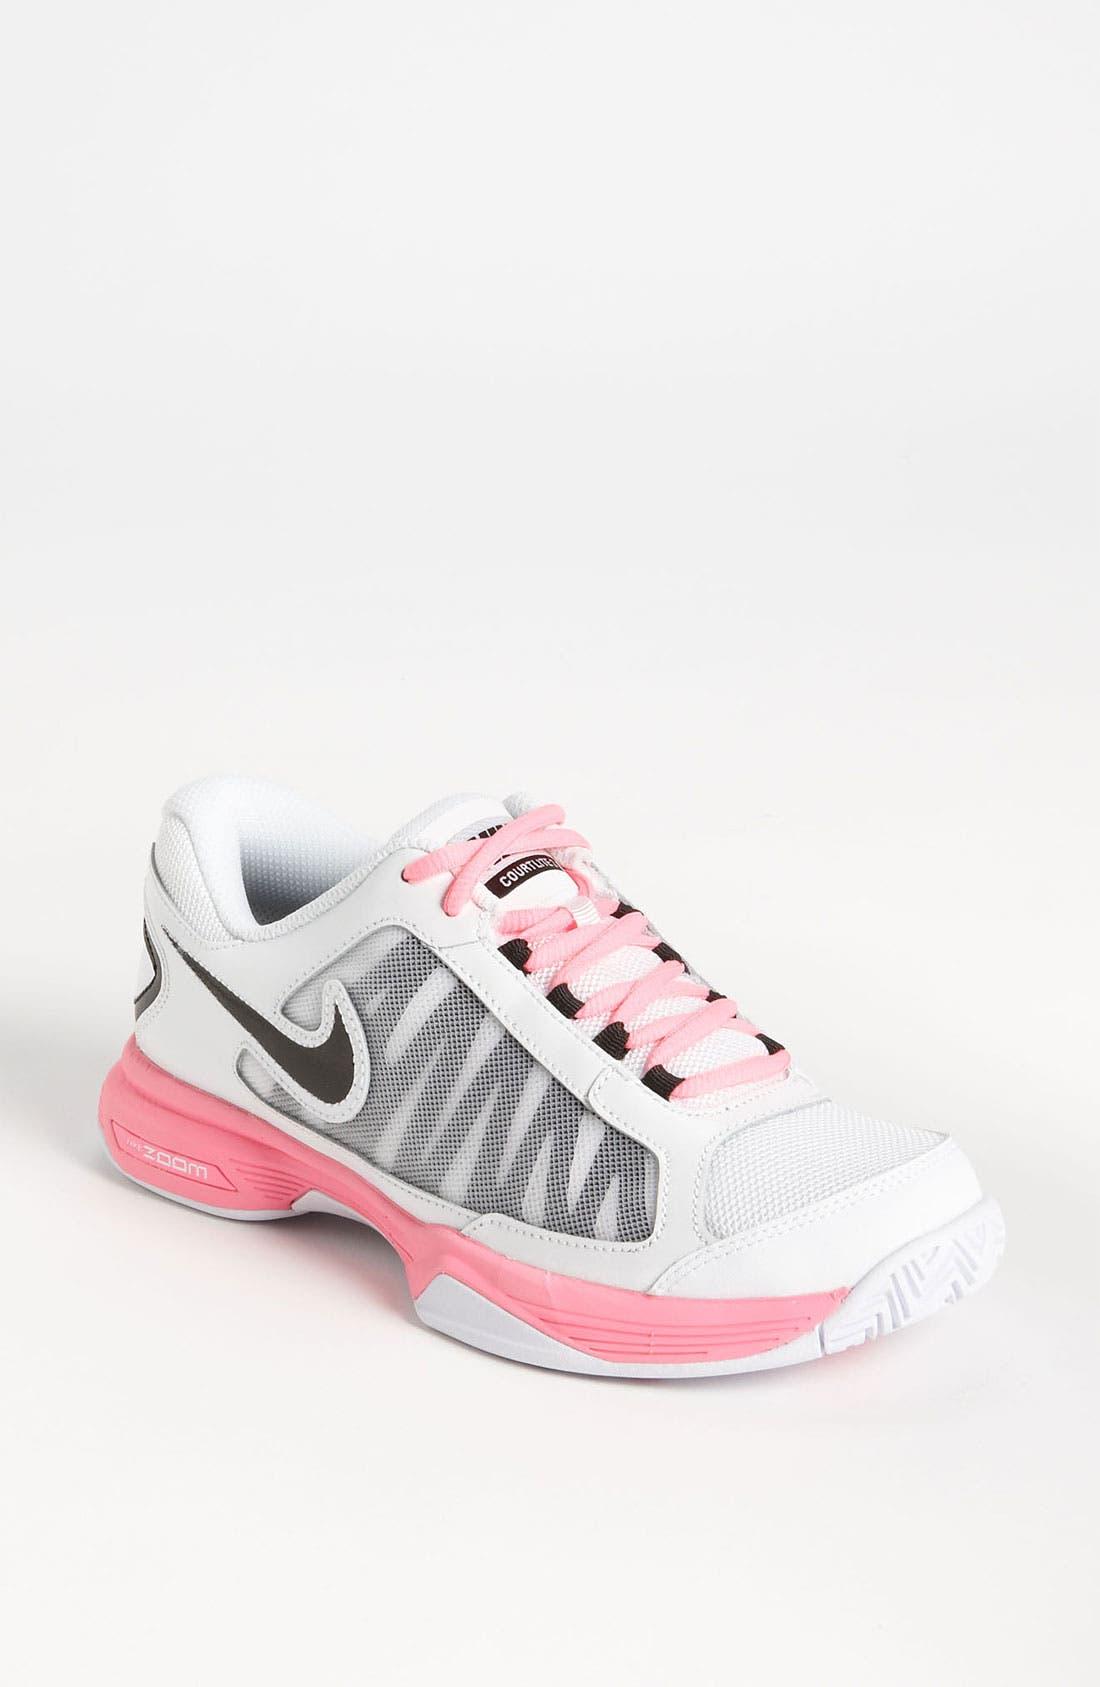 Main Image - Nike 'Zoom Courtlite 3' Tennis Shoe (Women)